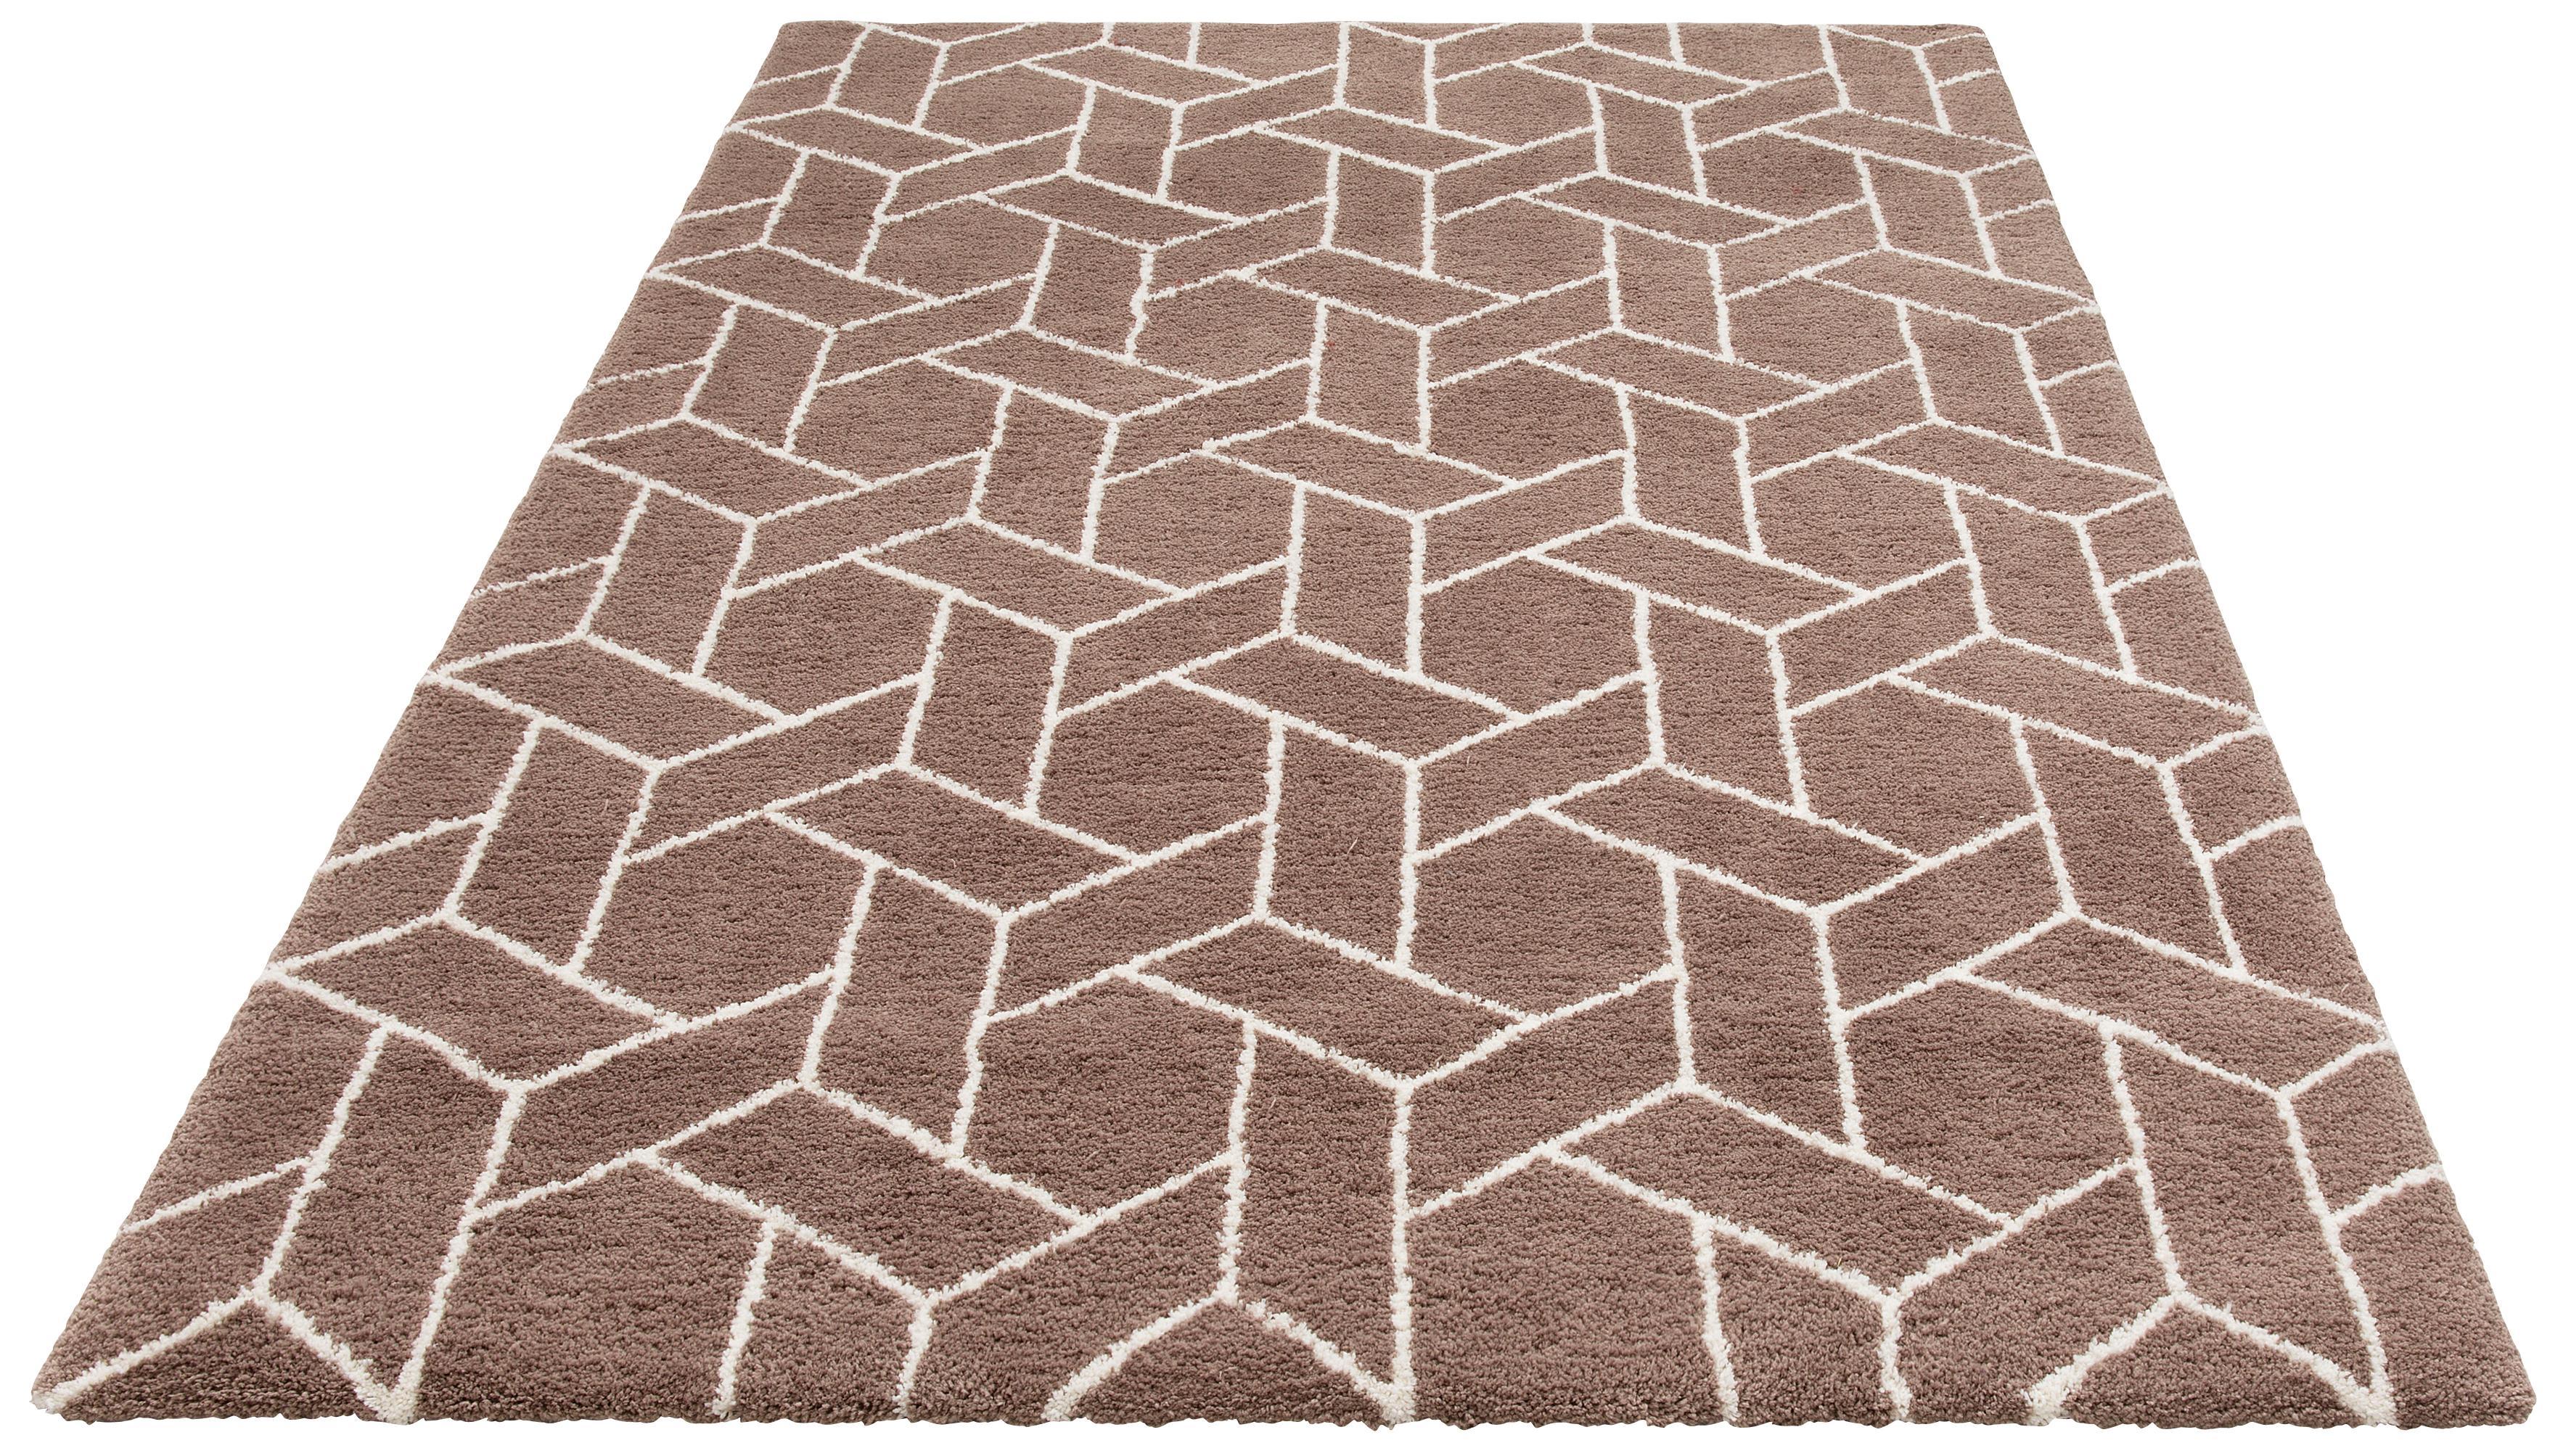 Teppich Milan my home rechteckig Höhe 20 mm maschinell getuftet